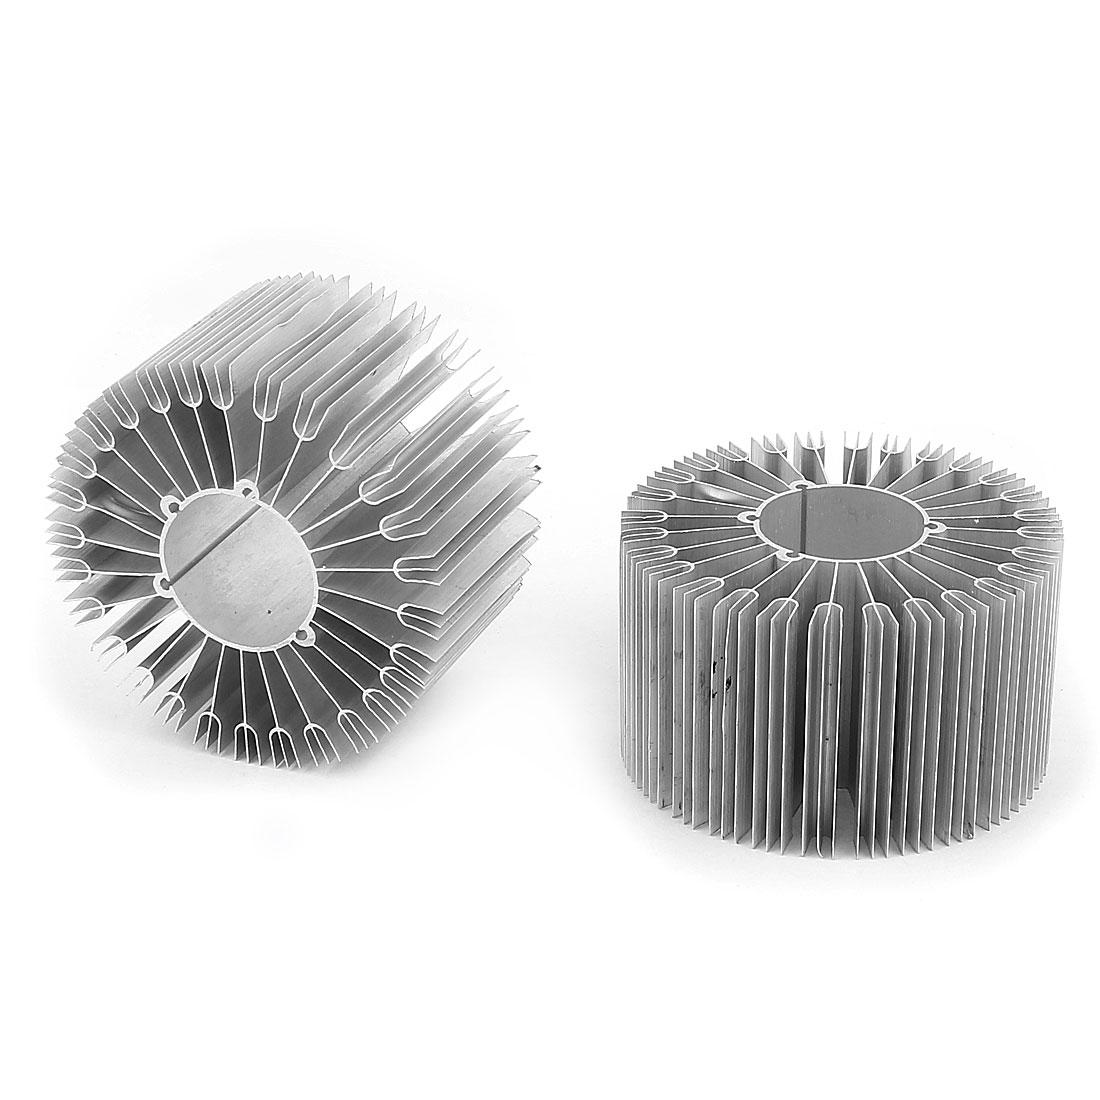 2 Pcs Led Lamp Aluminum Heatsink Radiator Cooling Fin 86mmx32mmx50mm Silver Tone